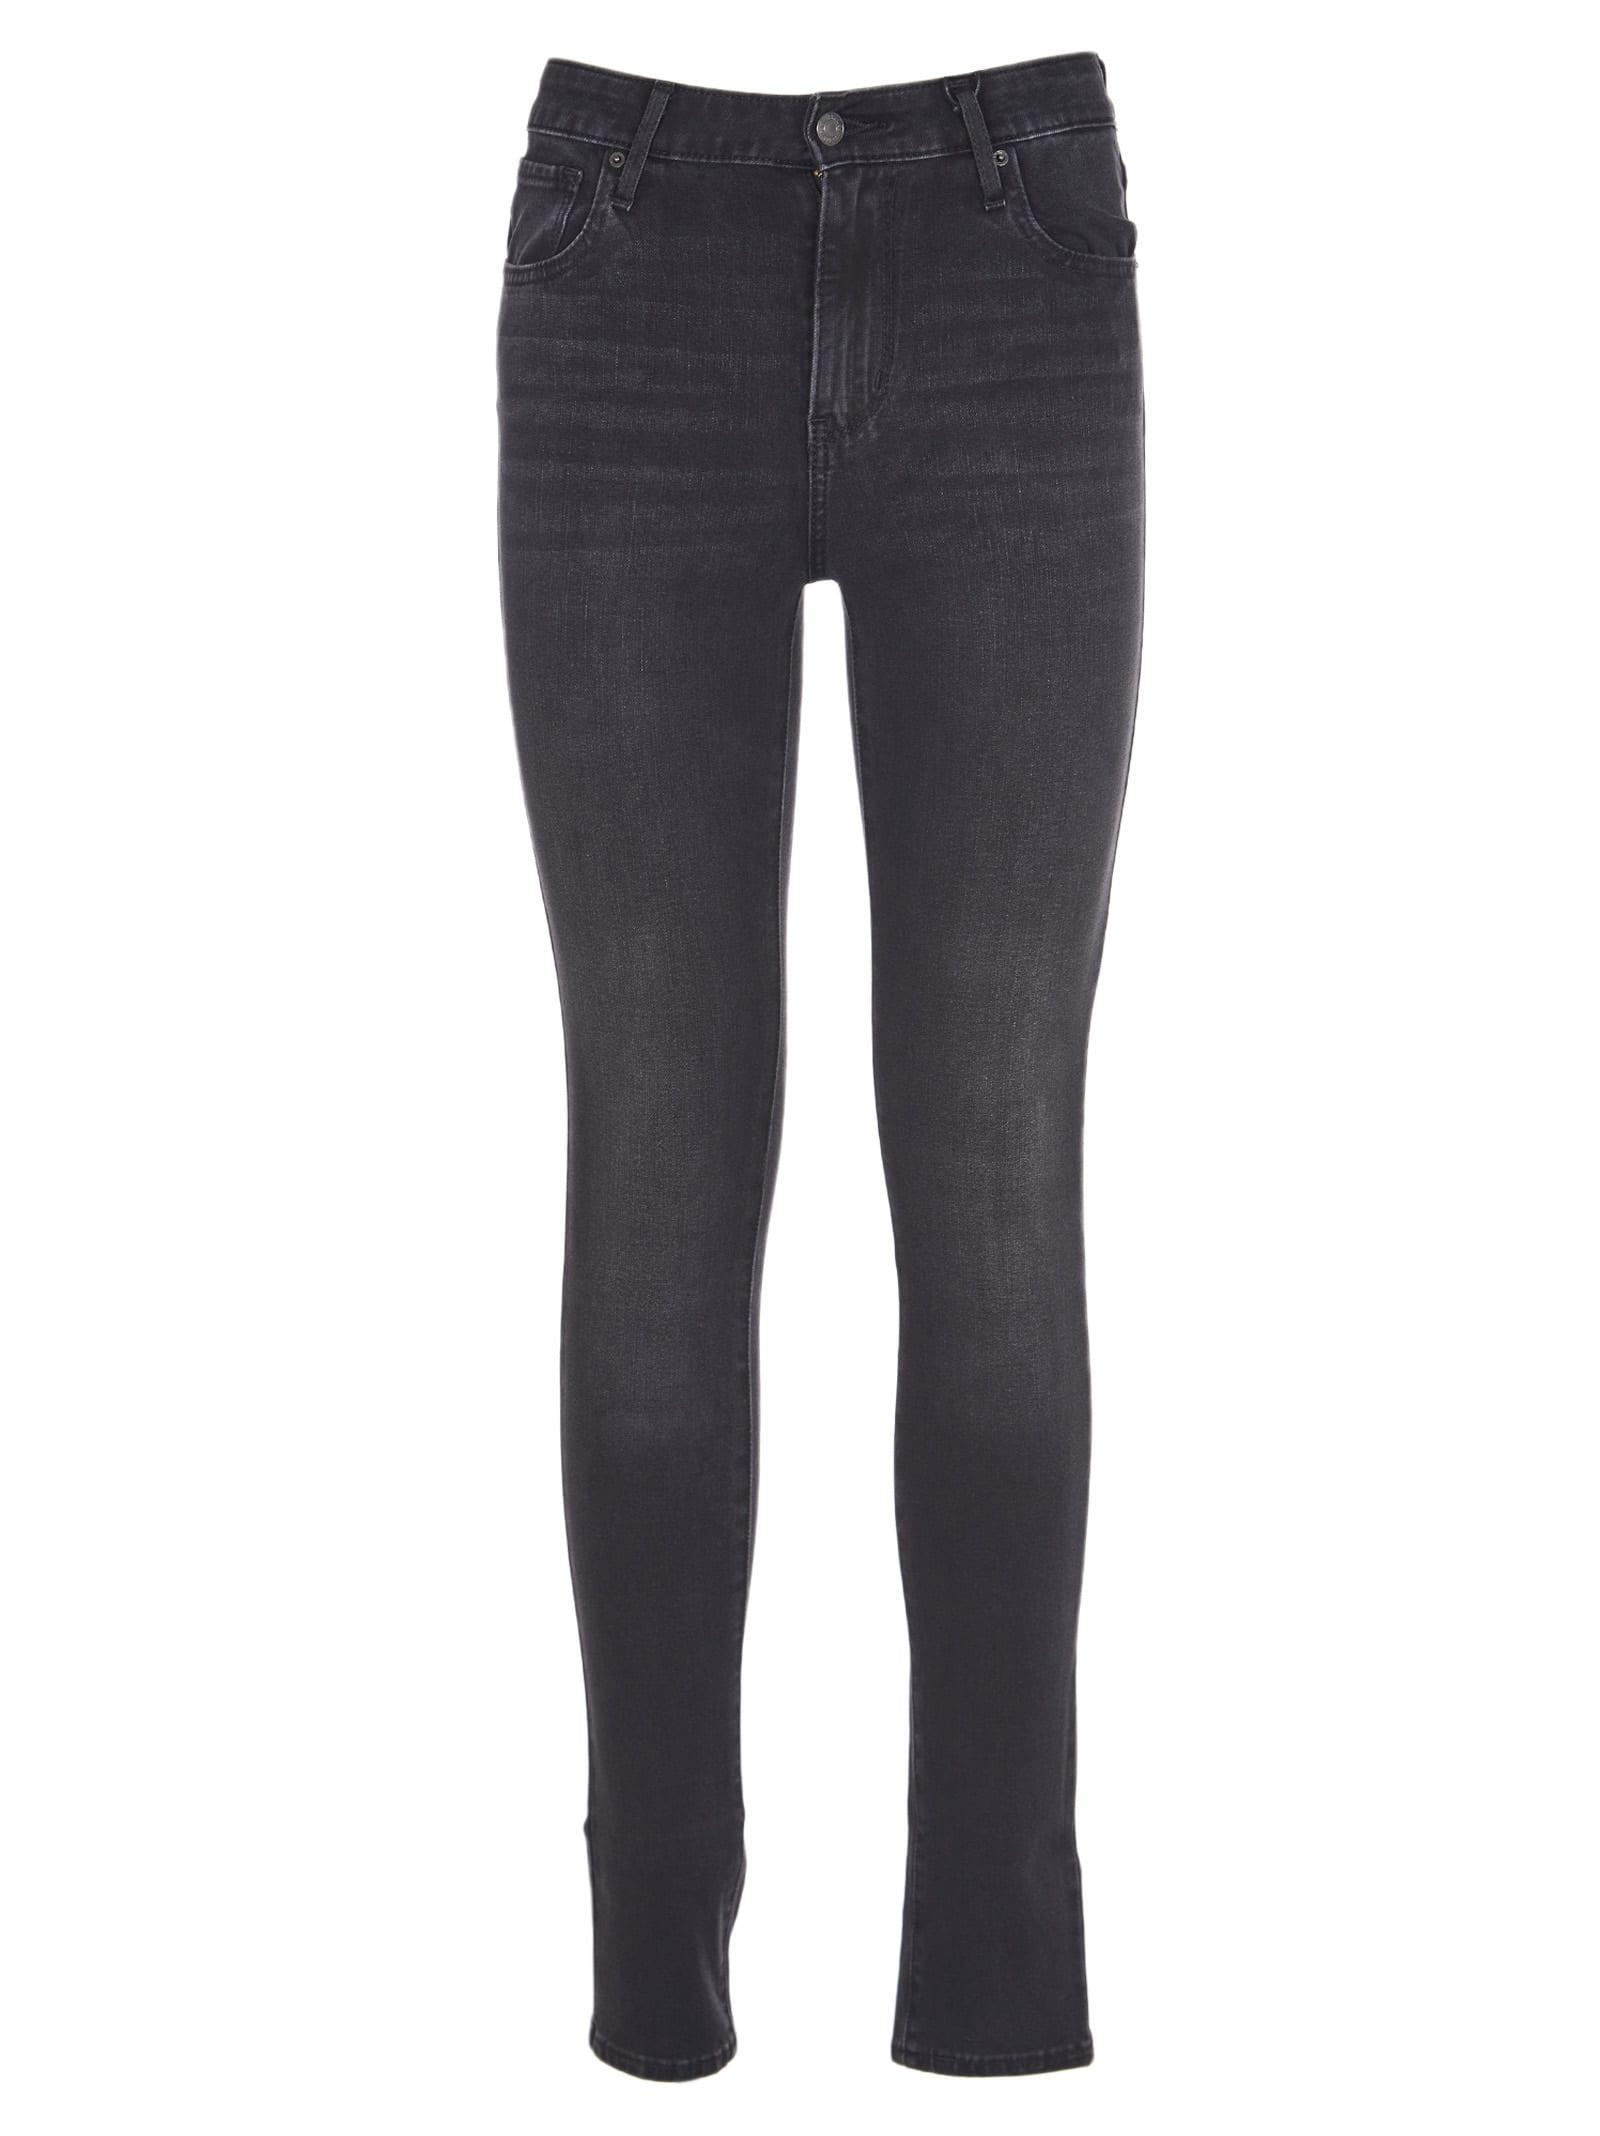 Levis Black Hight Waist 721 Jeans